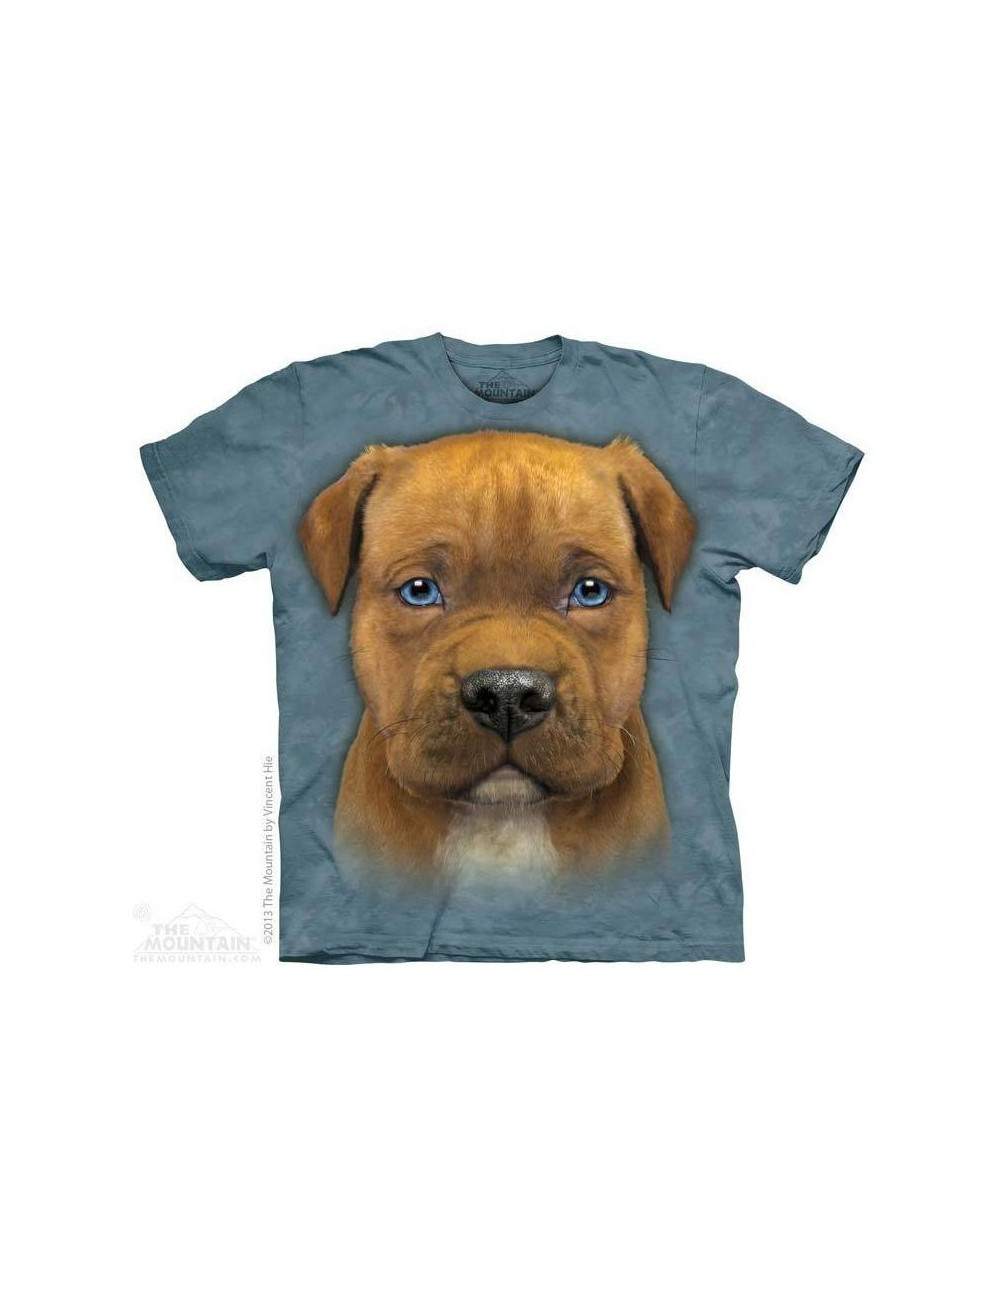 Tricou The Mountain copii: Pit Bull Puppy